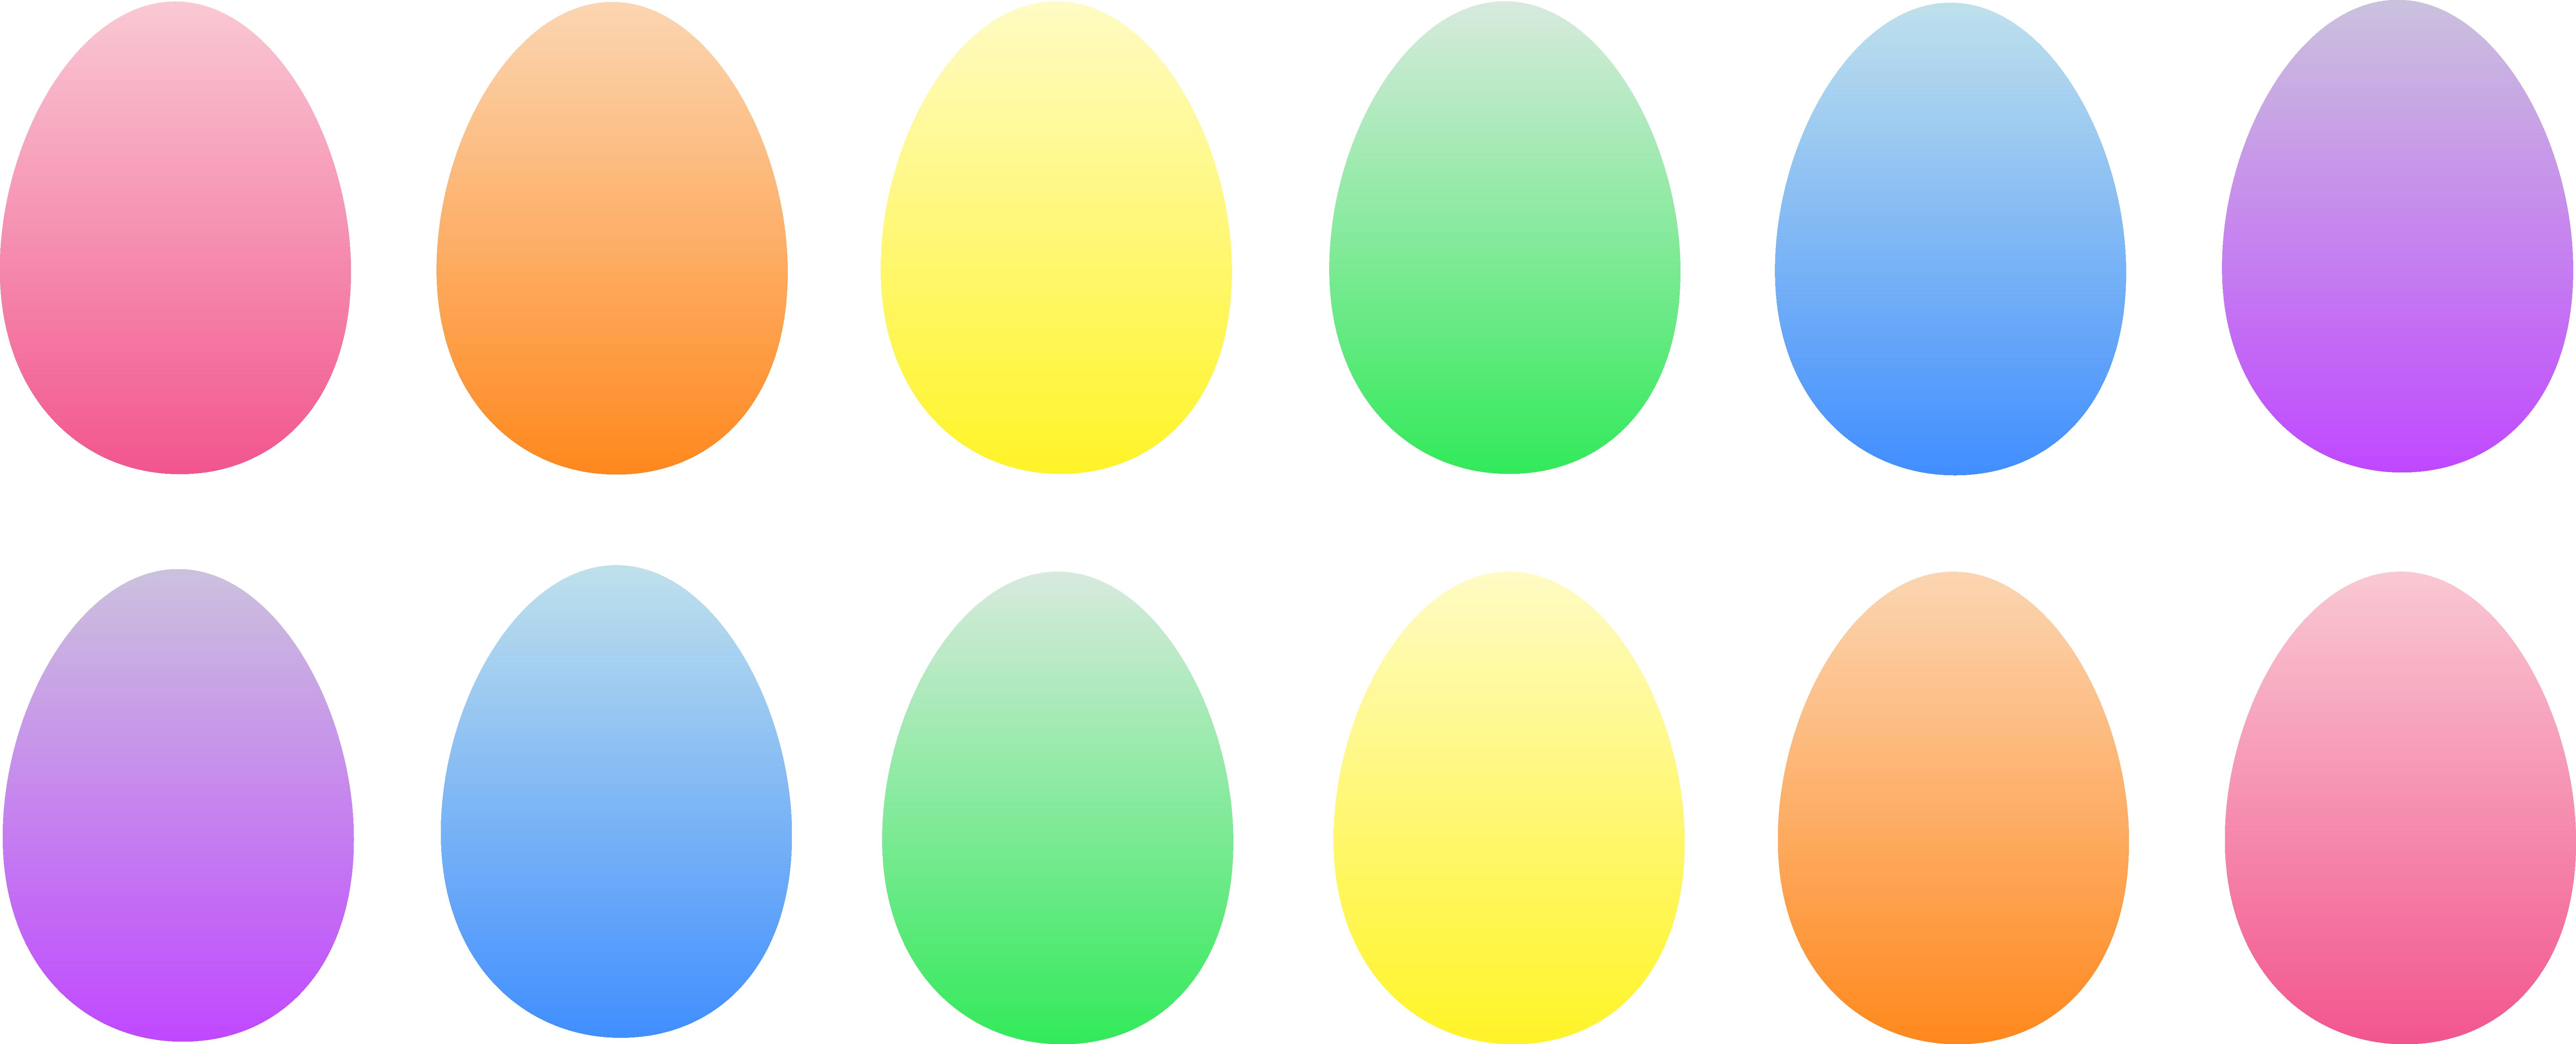 7508x3043 A Dozen Colored Easter Eggs